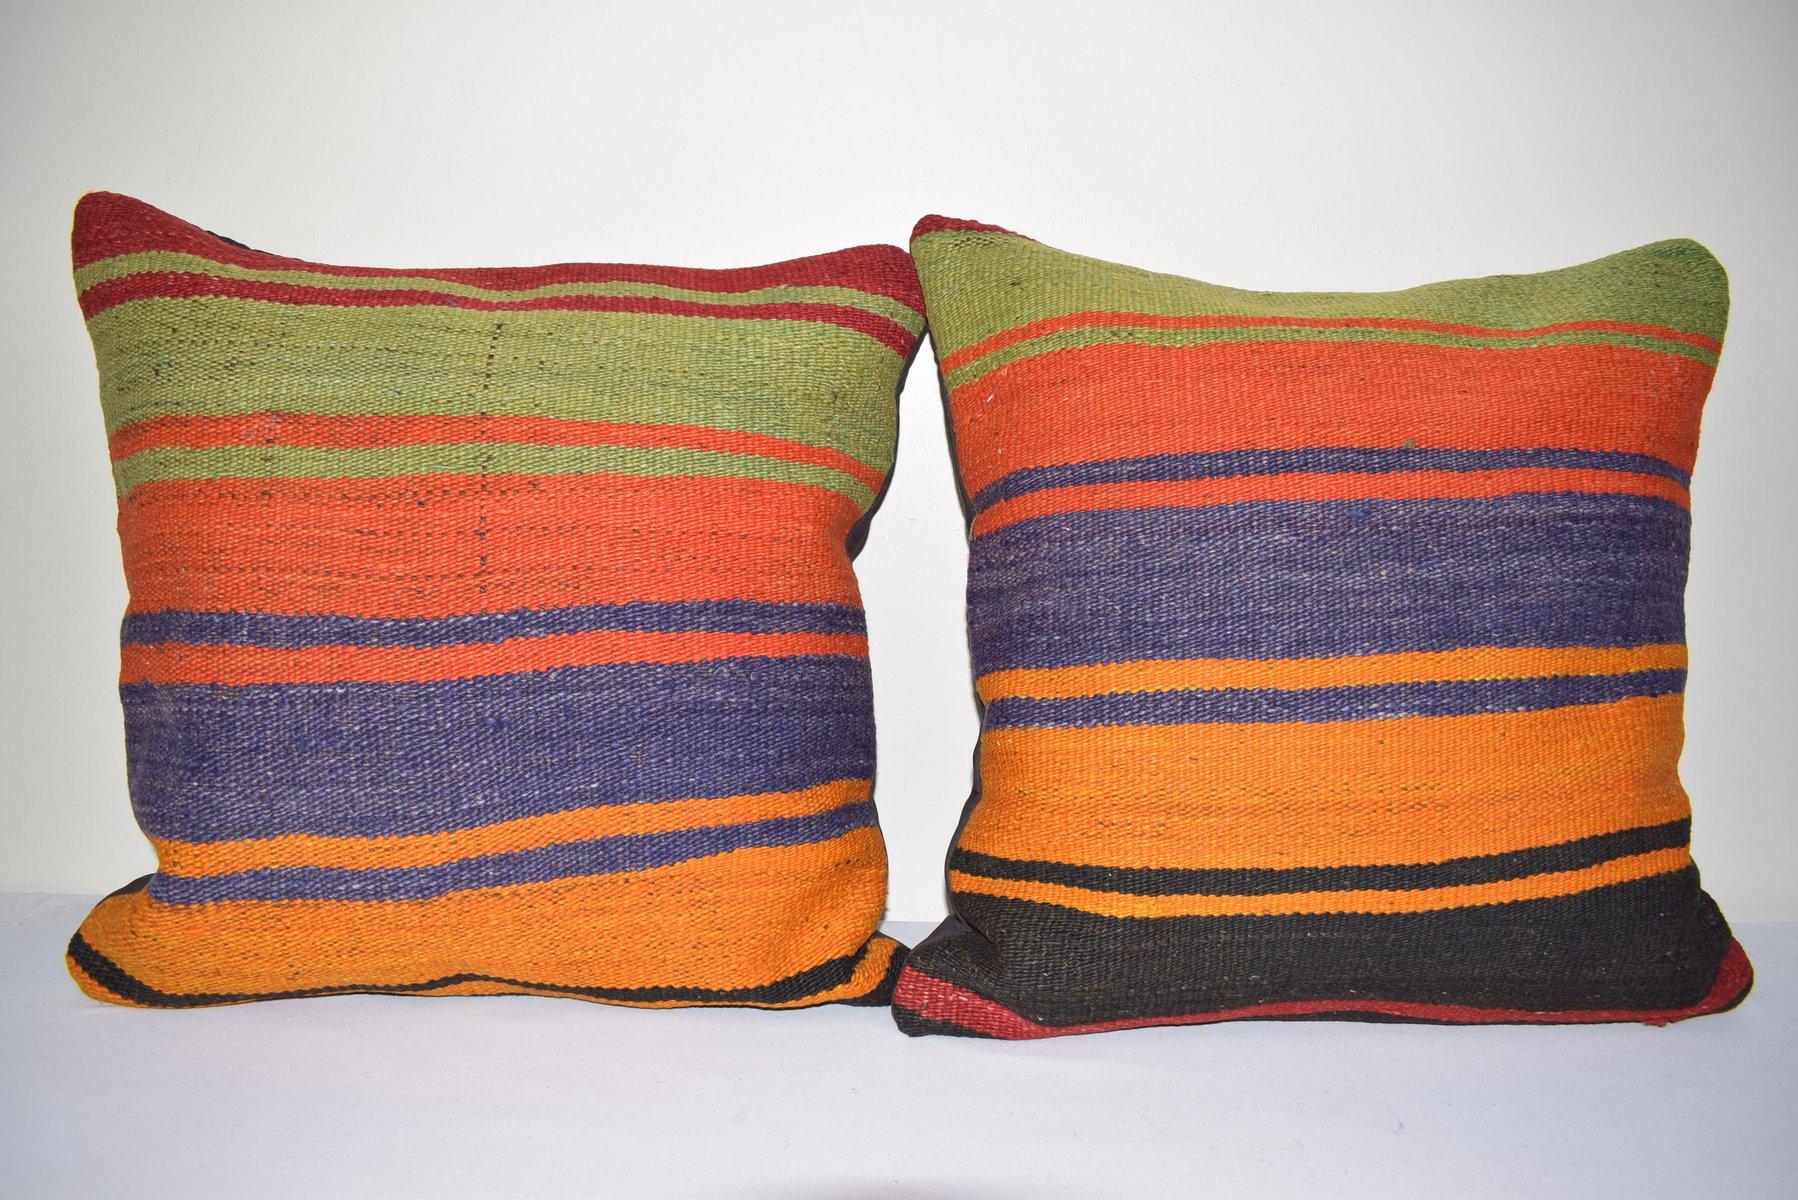 rustic kilim throw cushion covers set of 2